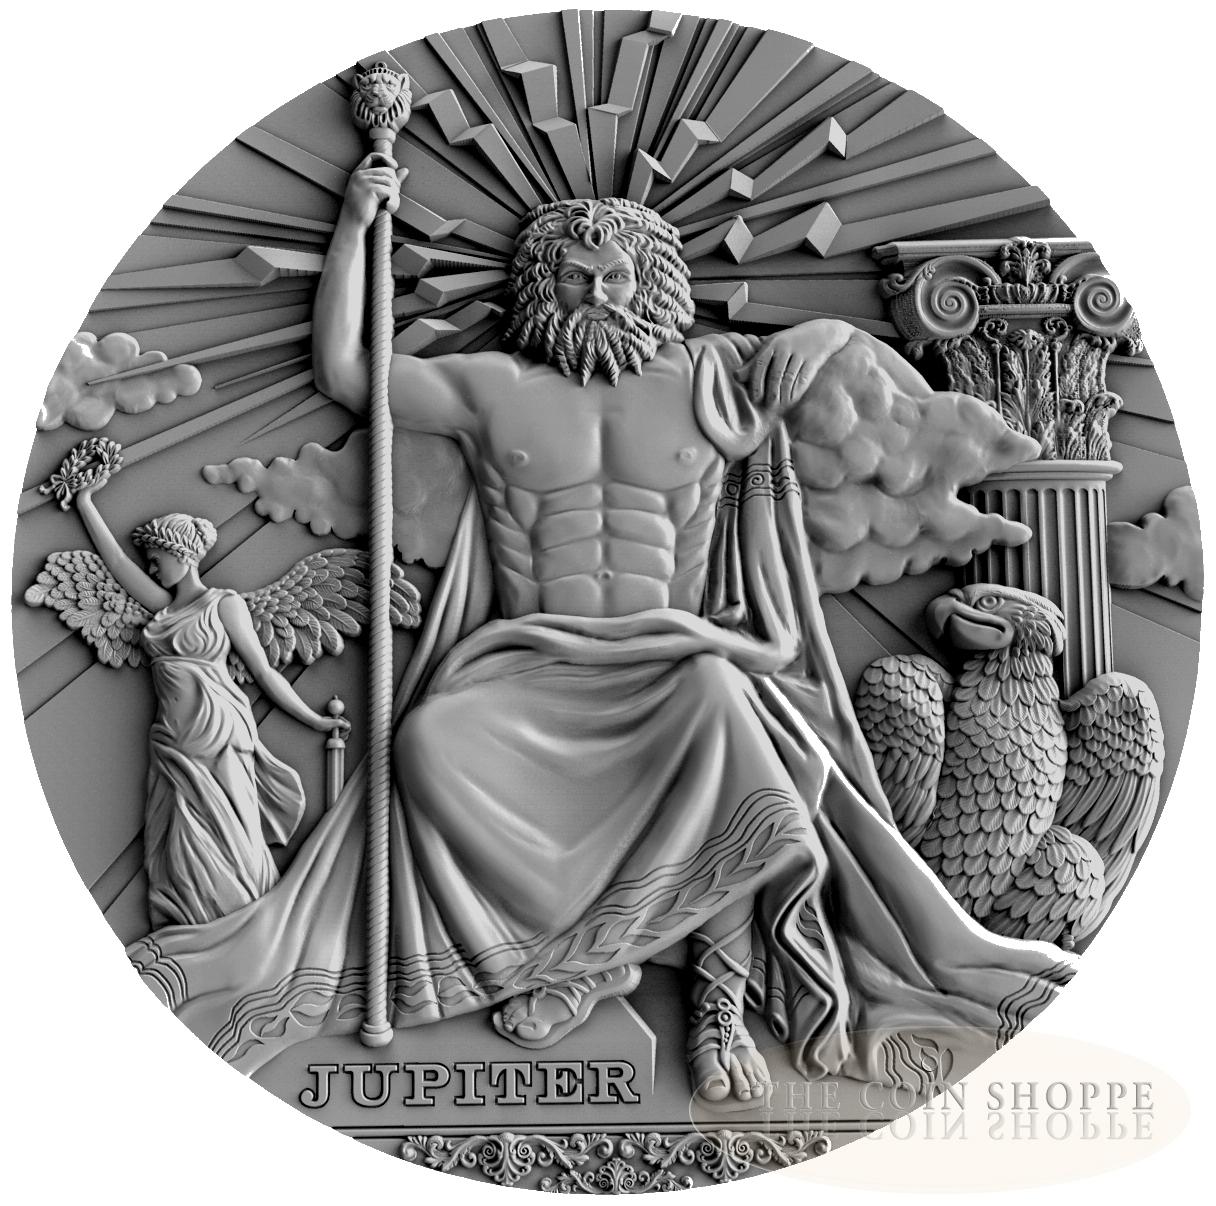 Jupiter Roman Gods 2016 2 Oz Ultra High Relief Pure